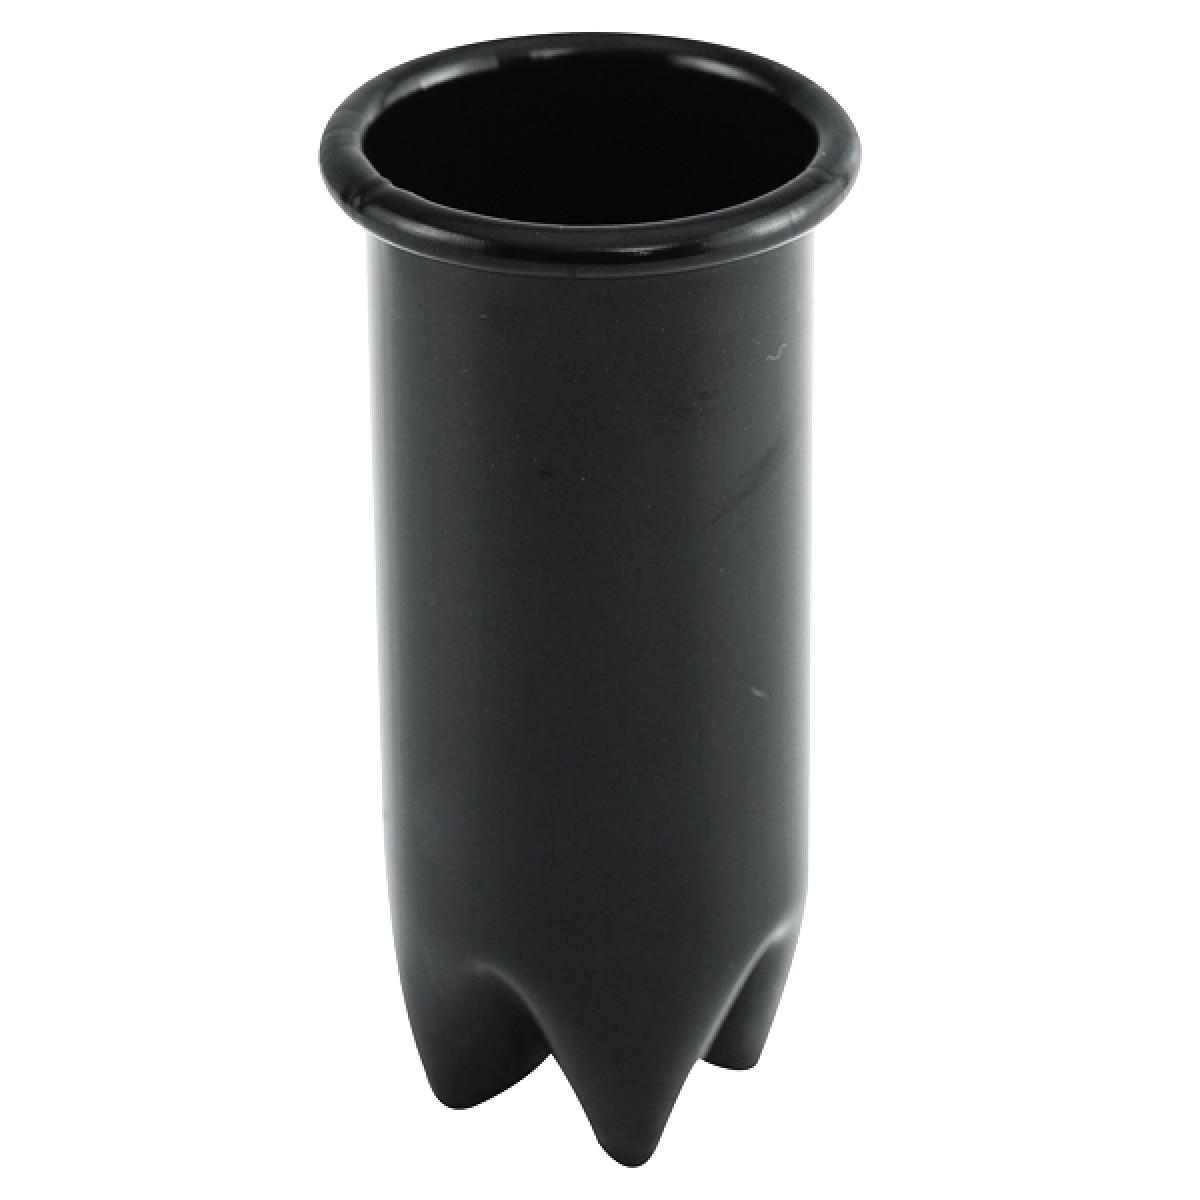 "Black Curling & Flat Iron Holder (1.75"")"